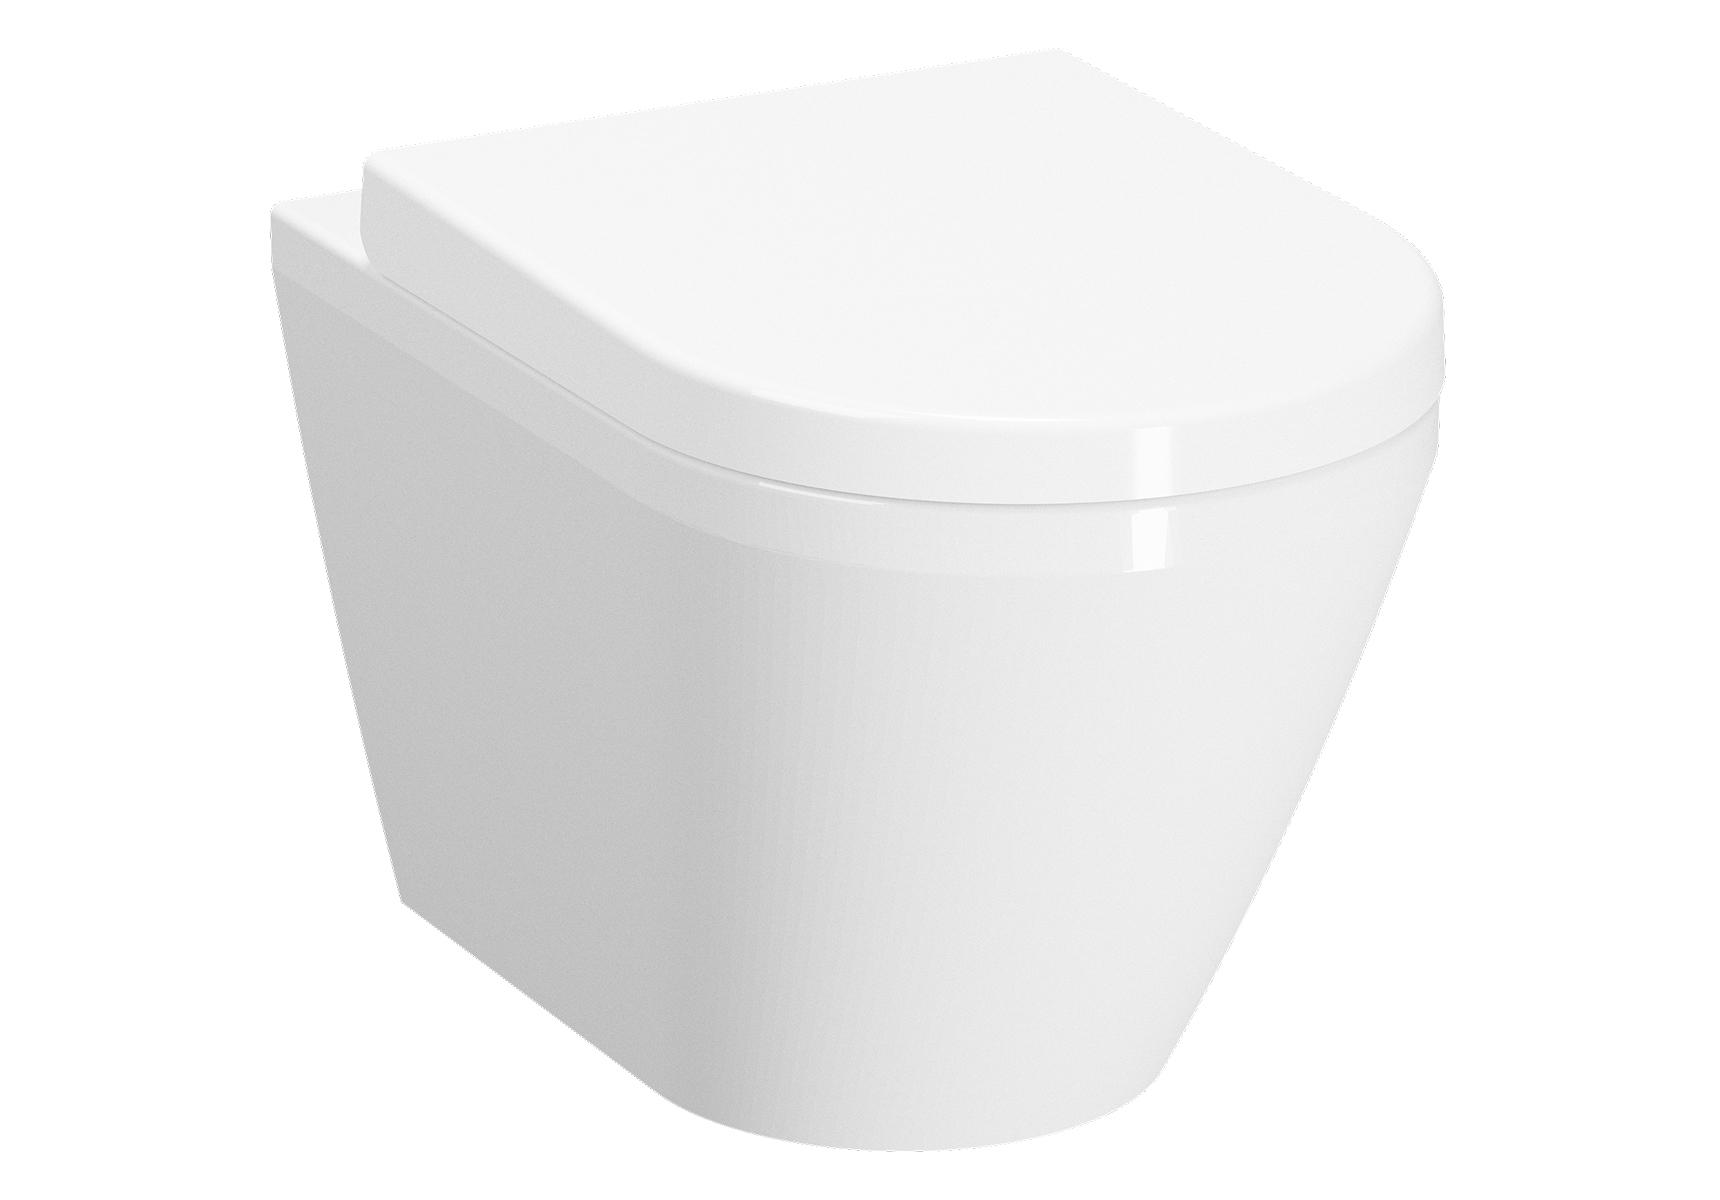 Integra WC suspendu, 54 cm, avec bride, fixation